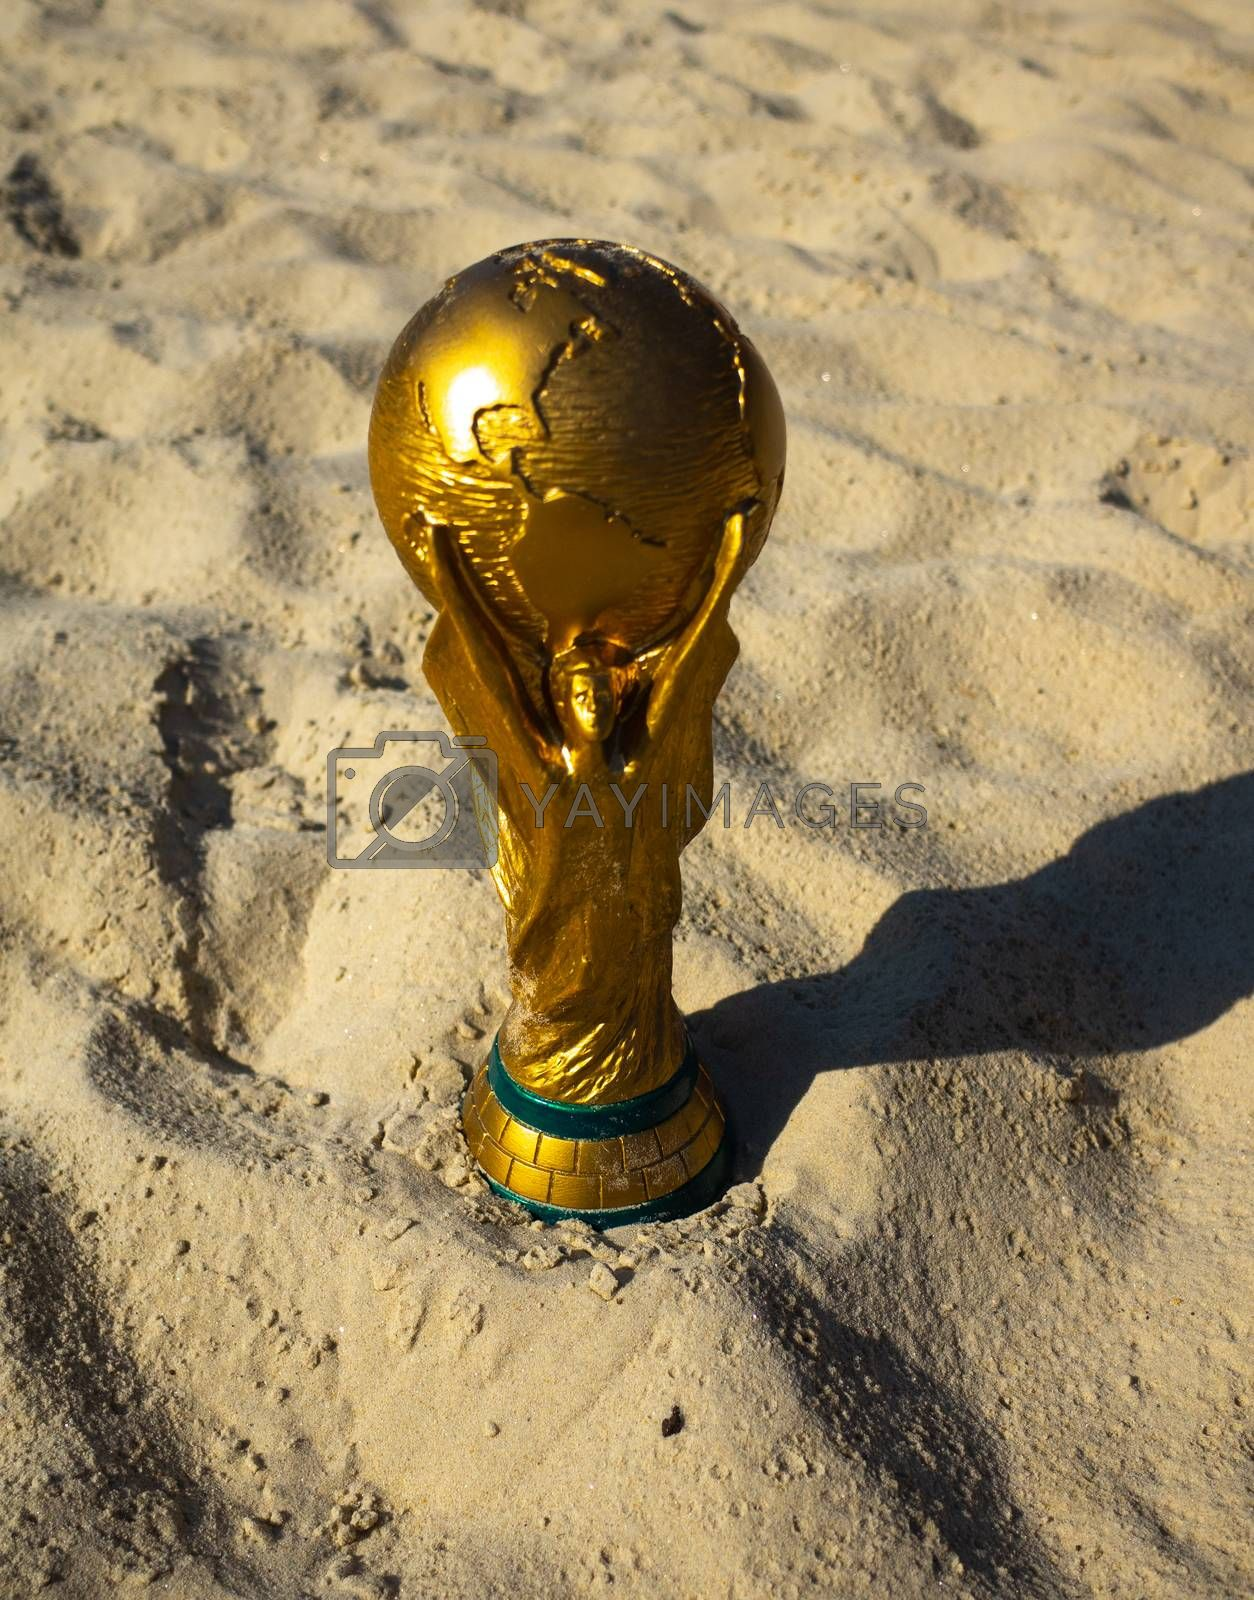 May 30, 2019. Doha, Qatar. FIFA World Cup trophy on sand. FIFA World Cup  2022  will be held in Qatar.